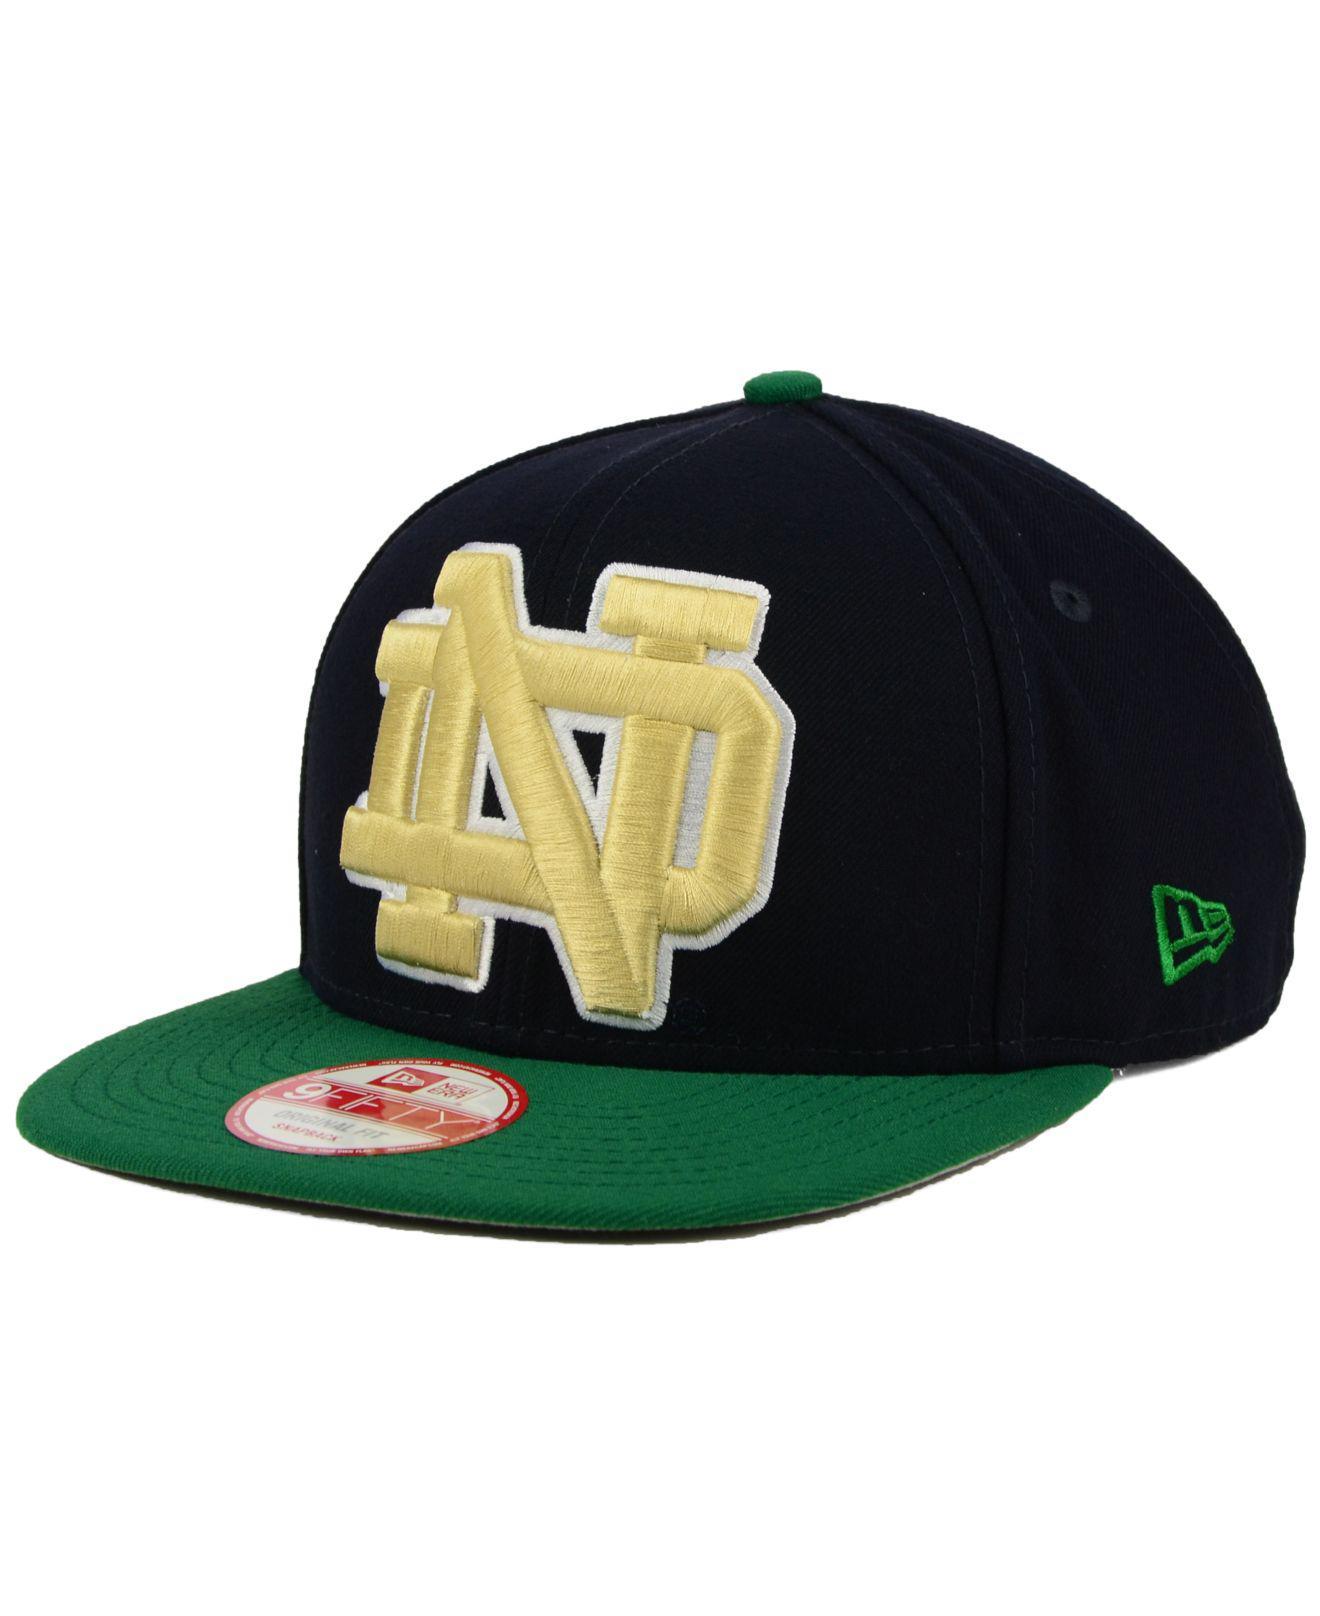 a5f2ade2d97 Lyst - Ktz Notre Dame Fighting Irish Logo Grand Redux 9fifty ...